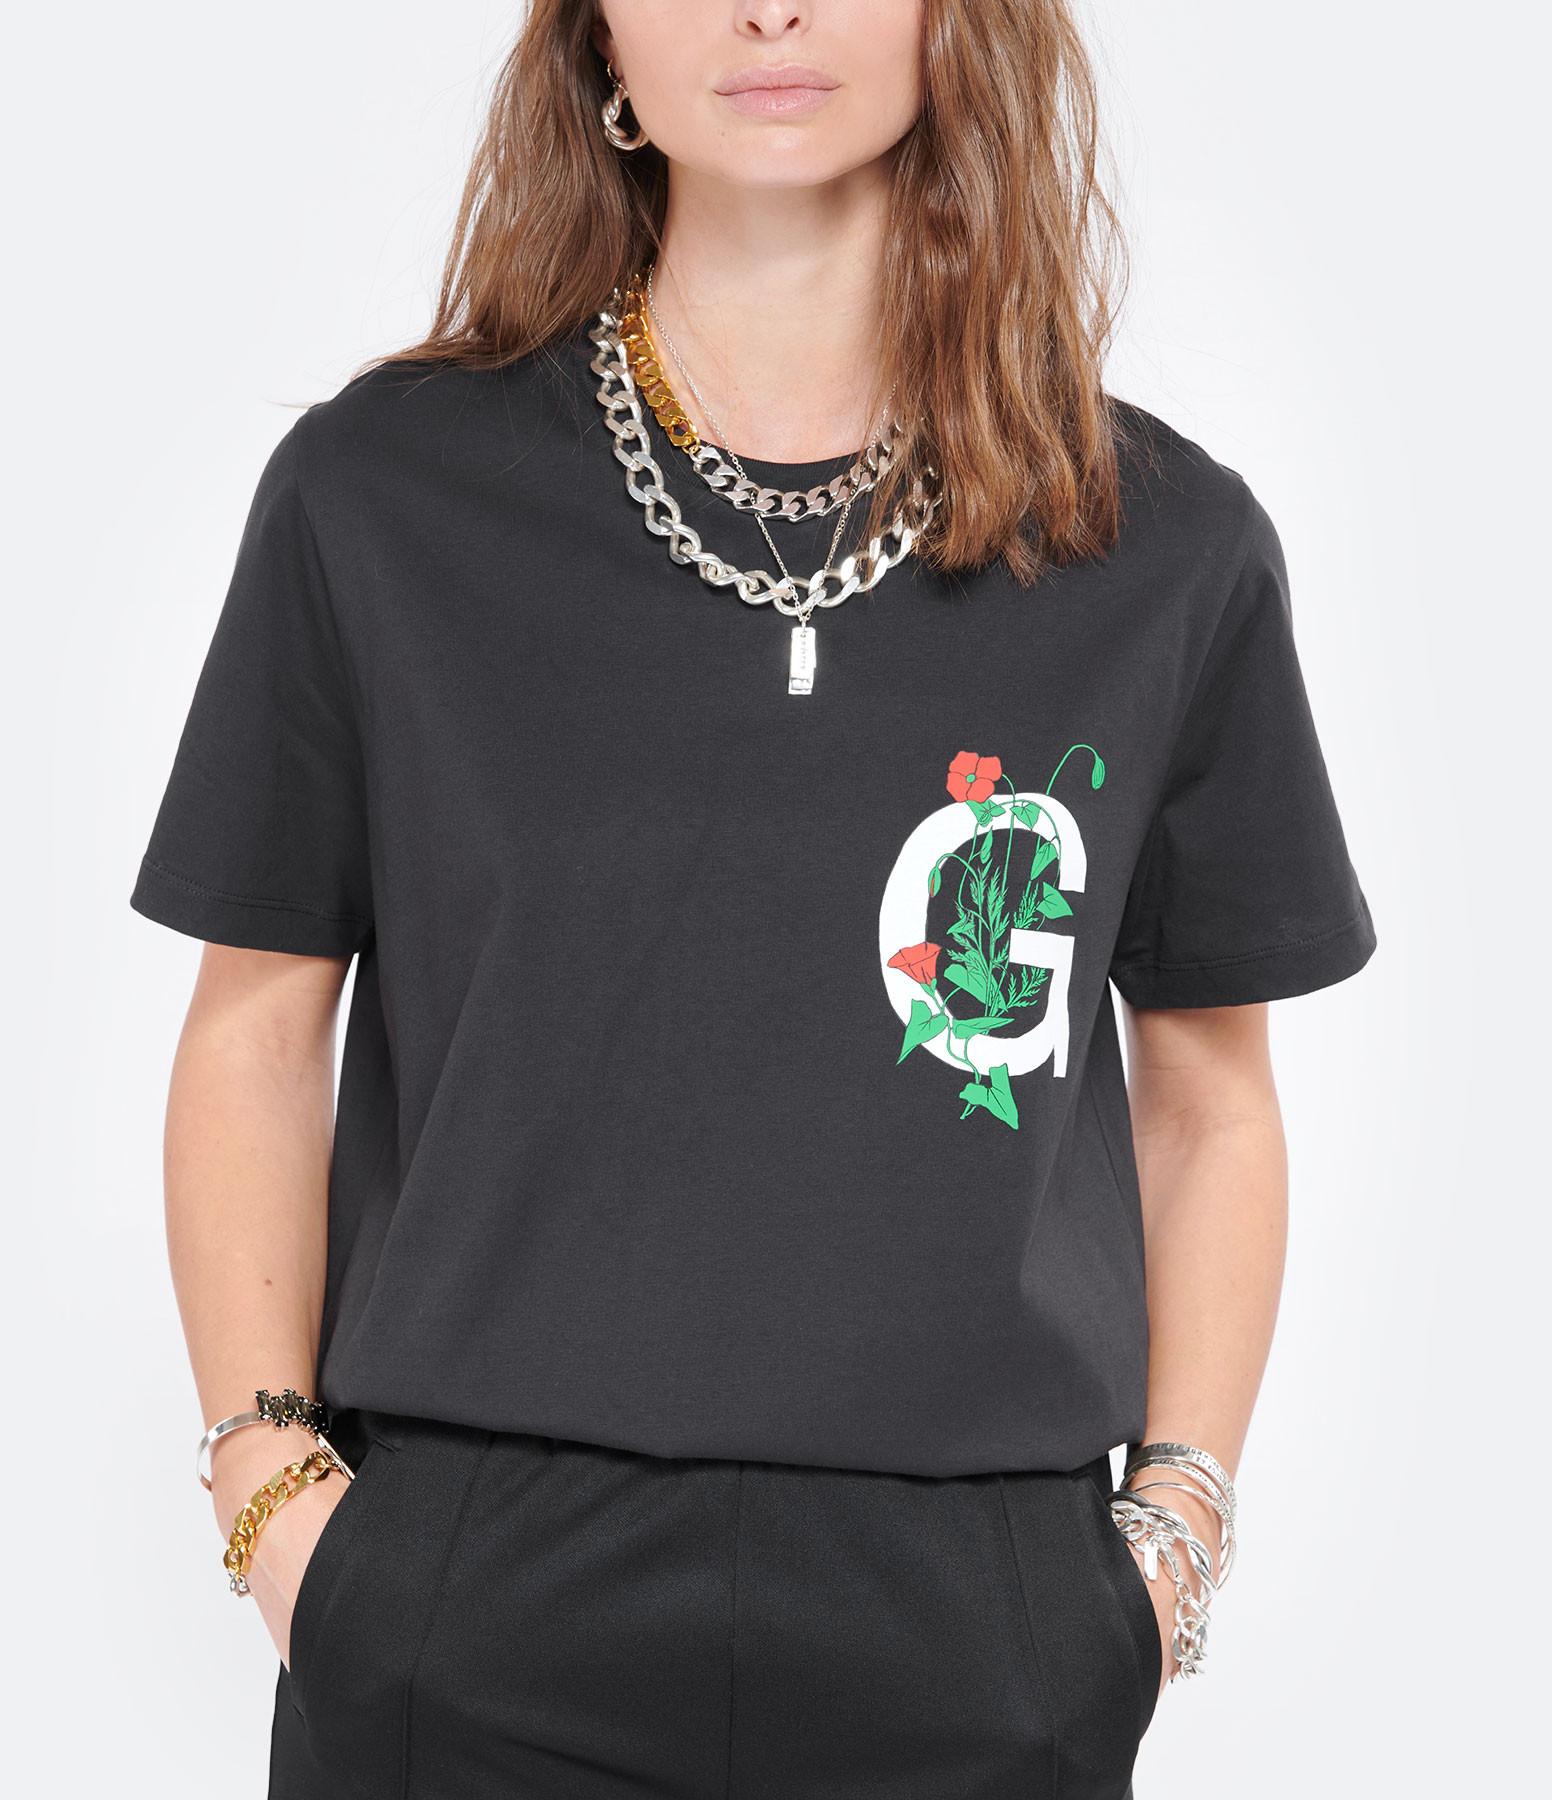 GANNI - Tee-shirt Logo Flower Coton Biologique Noir